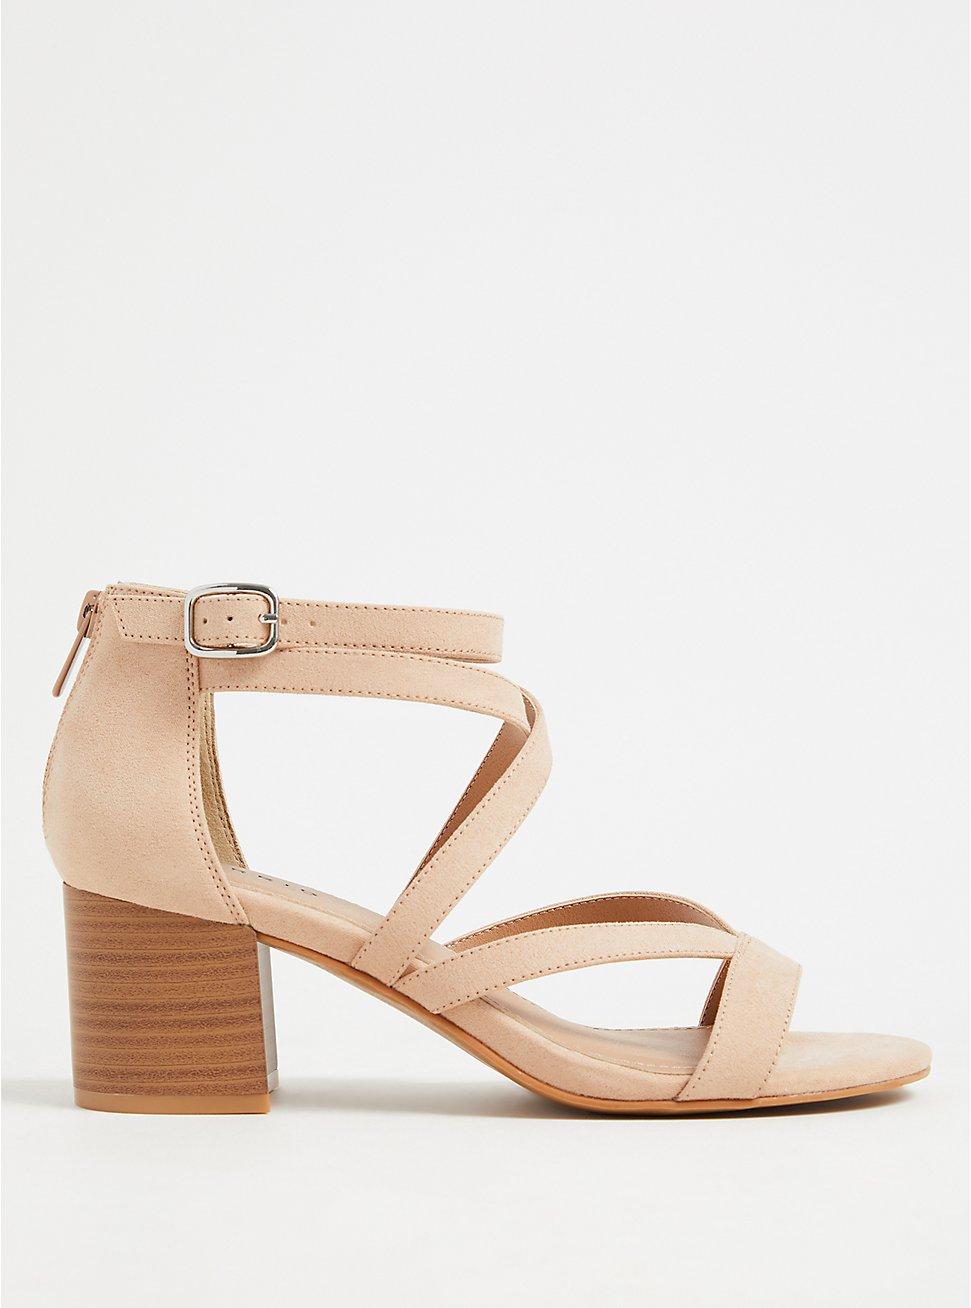 Beige Faux Suede Strappy Block Heel Sandal (WW), , hi-res